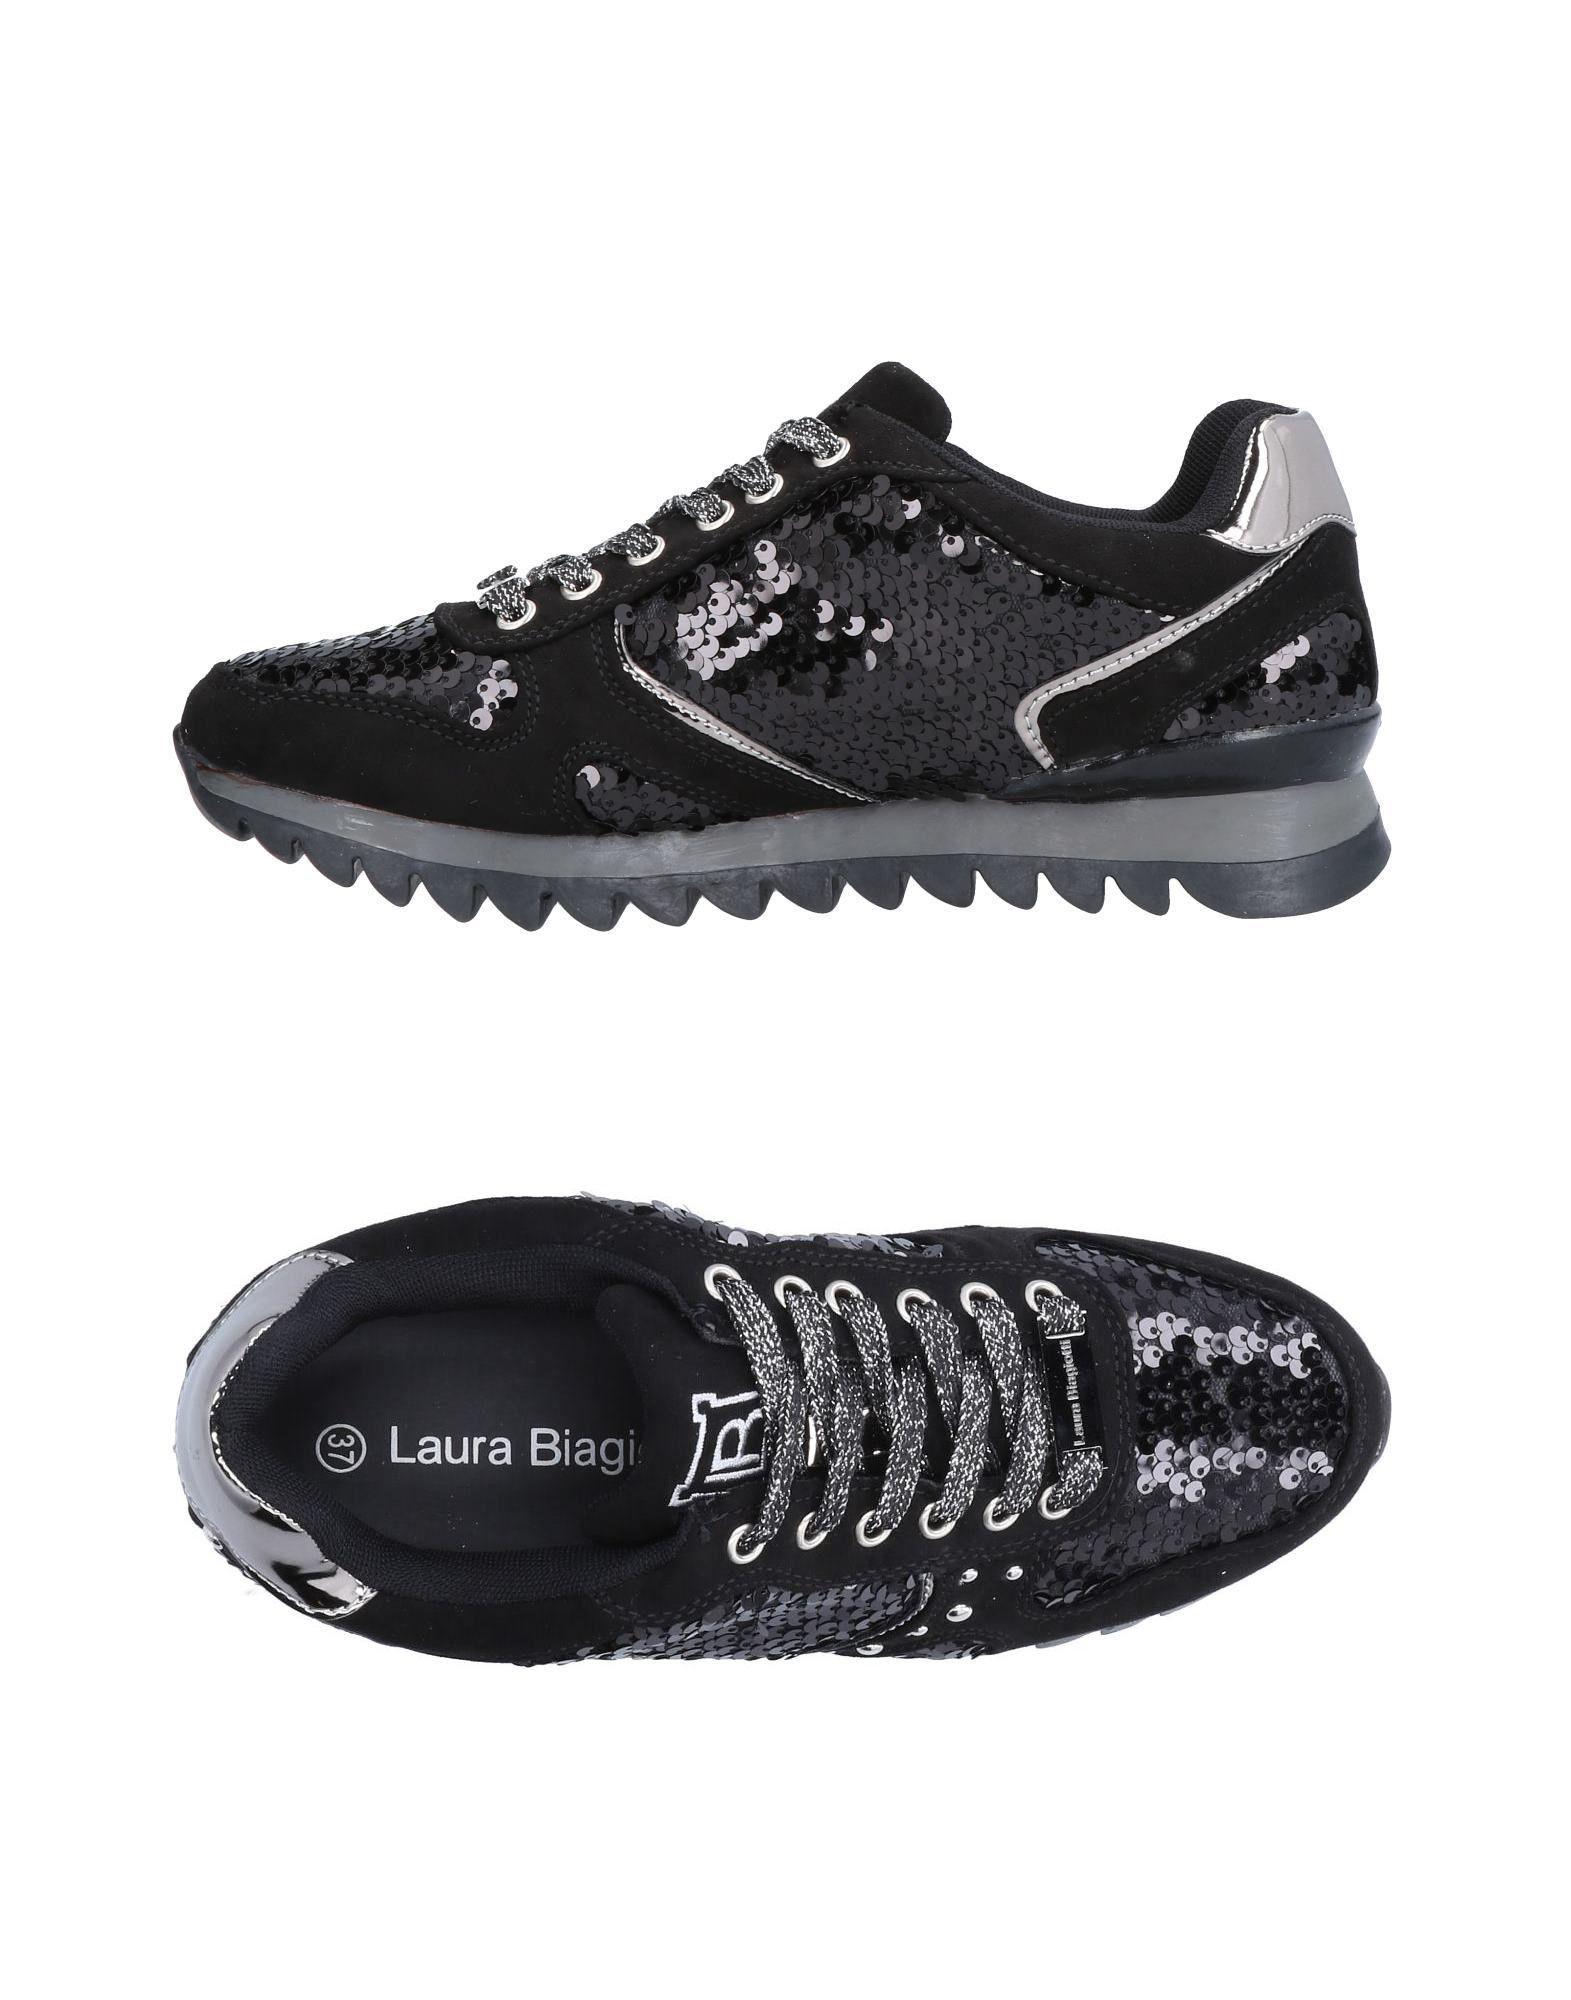 Laura Biagiotti Sneakers Damen  11506144VM Gute Qualität beliebte Schuhe